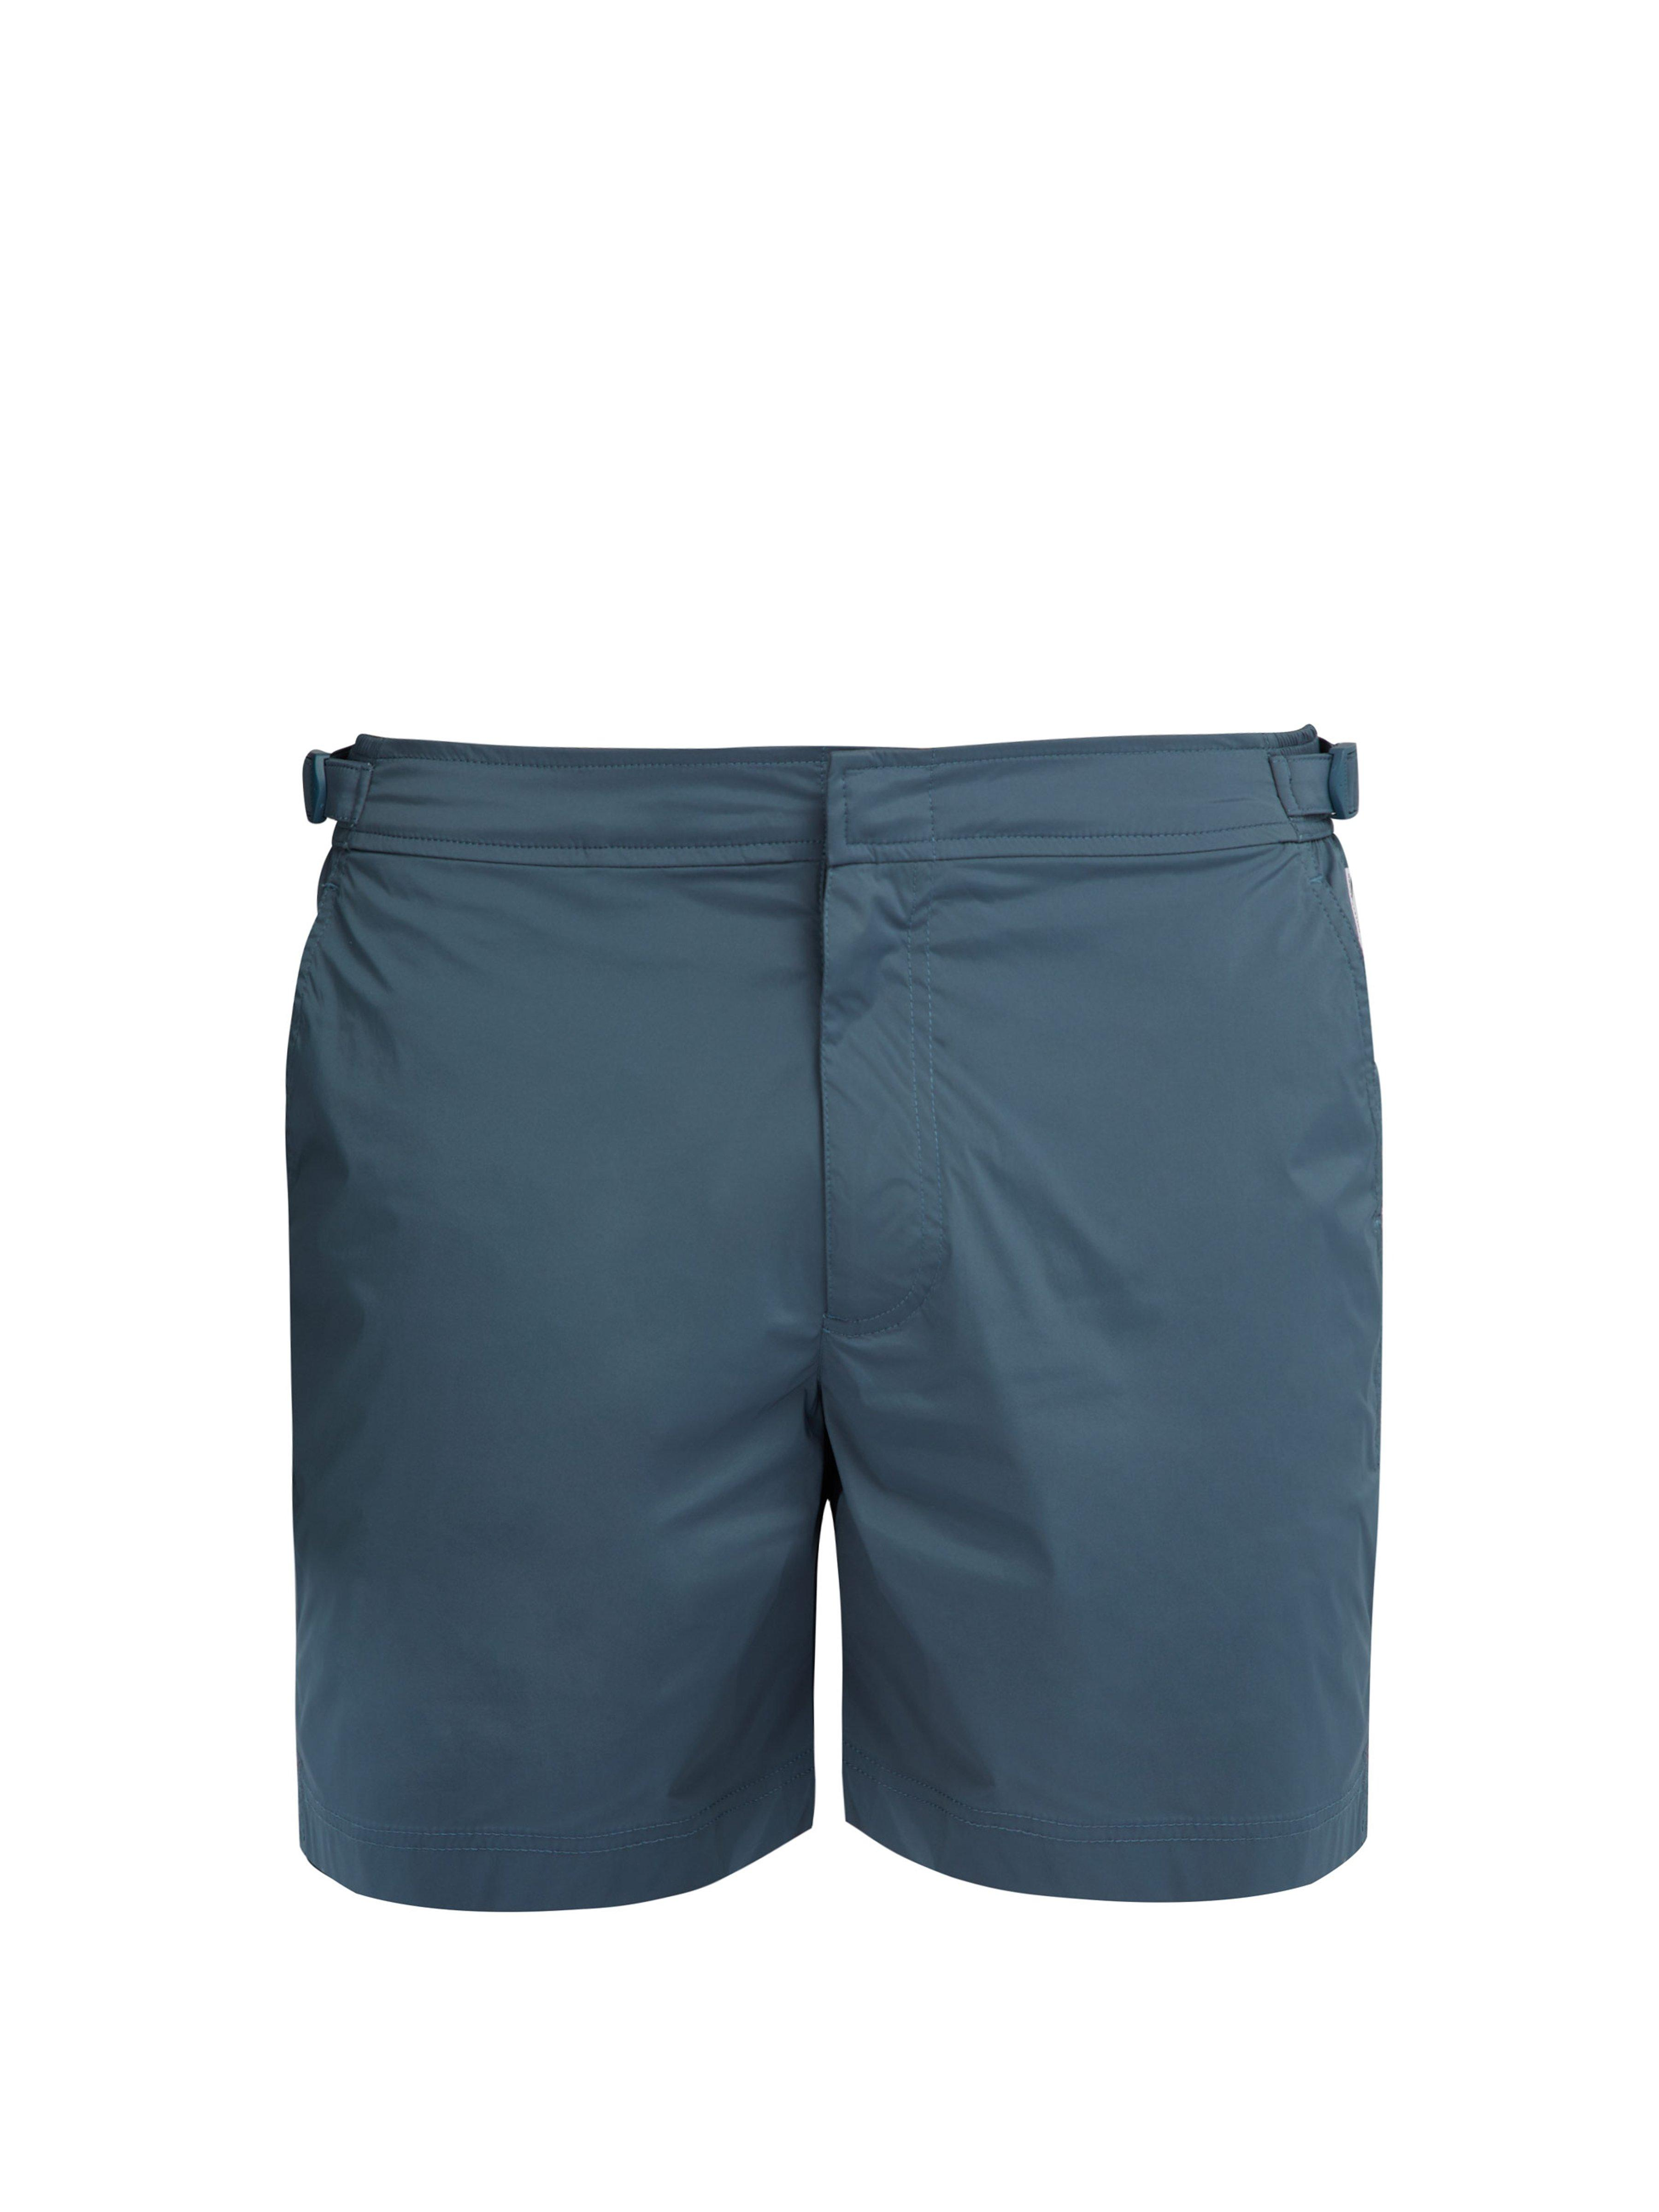 58243dc20986f Orlebar Brown Bulldog Swim Shorts in Blue for Men - Lyst